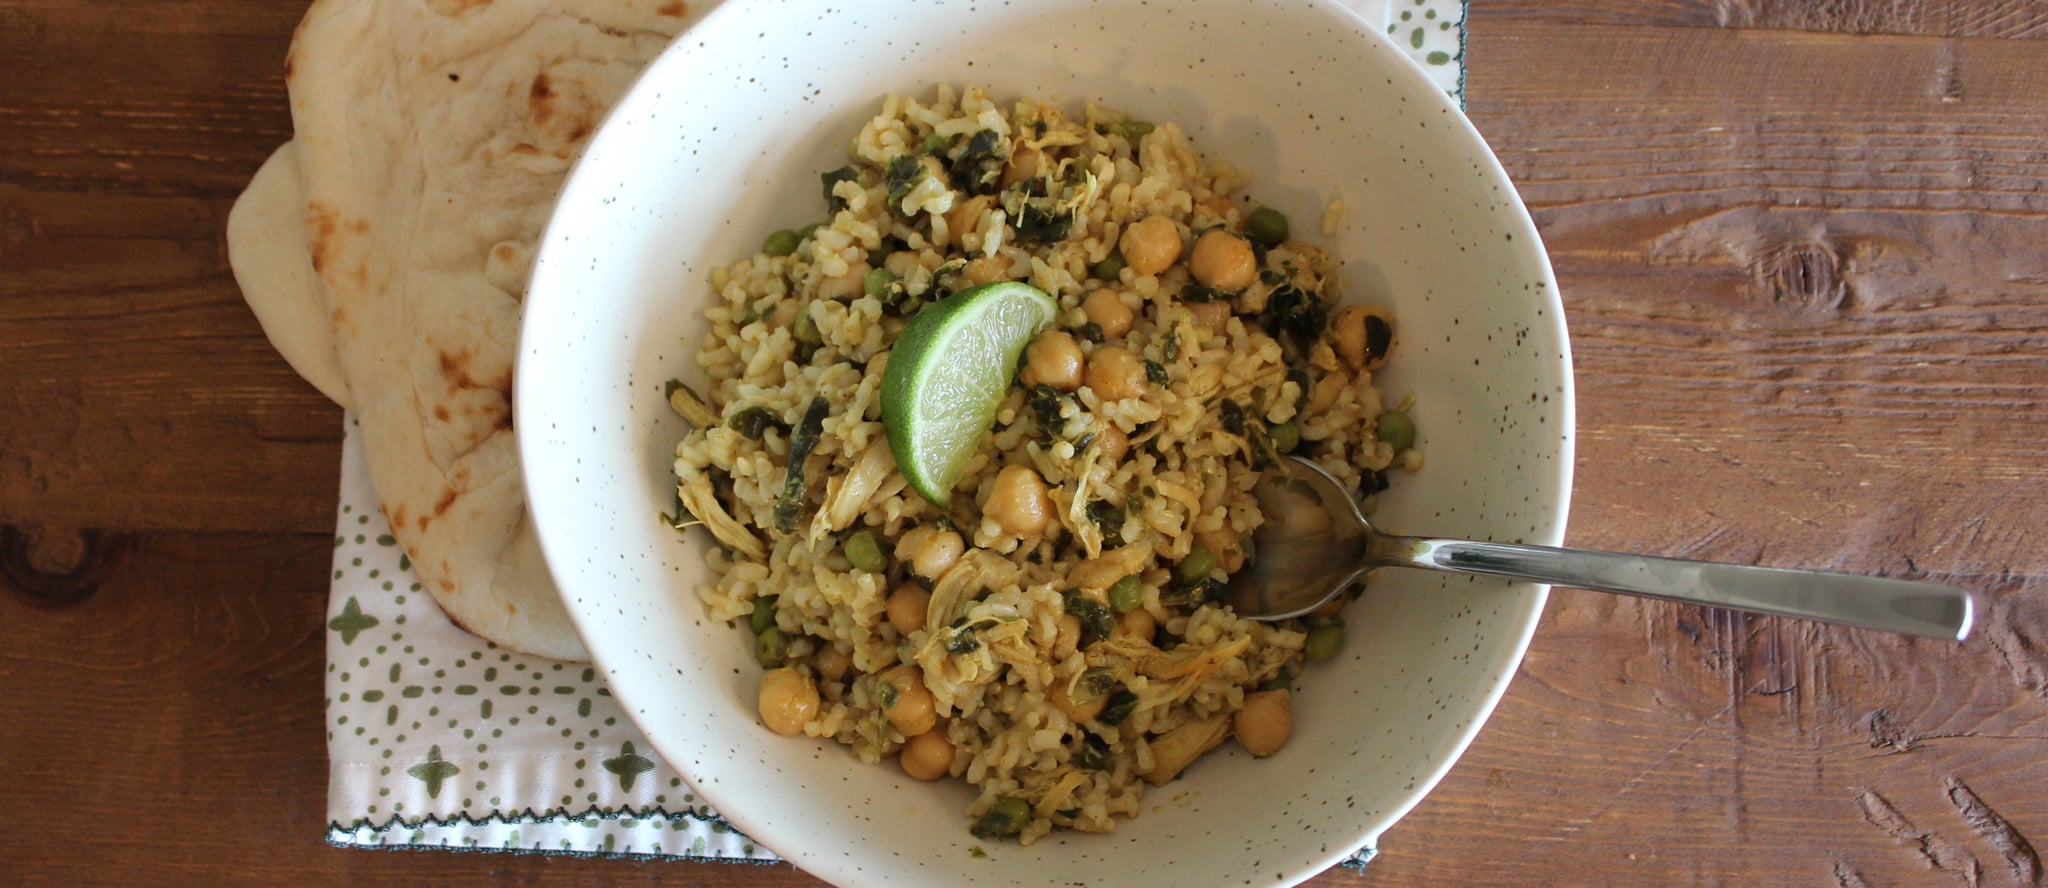 Instant Pot Chicken Curry Recipe | POPSUGAR Food